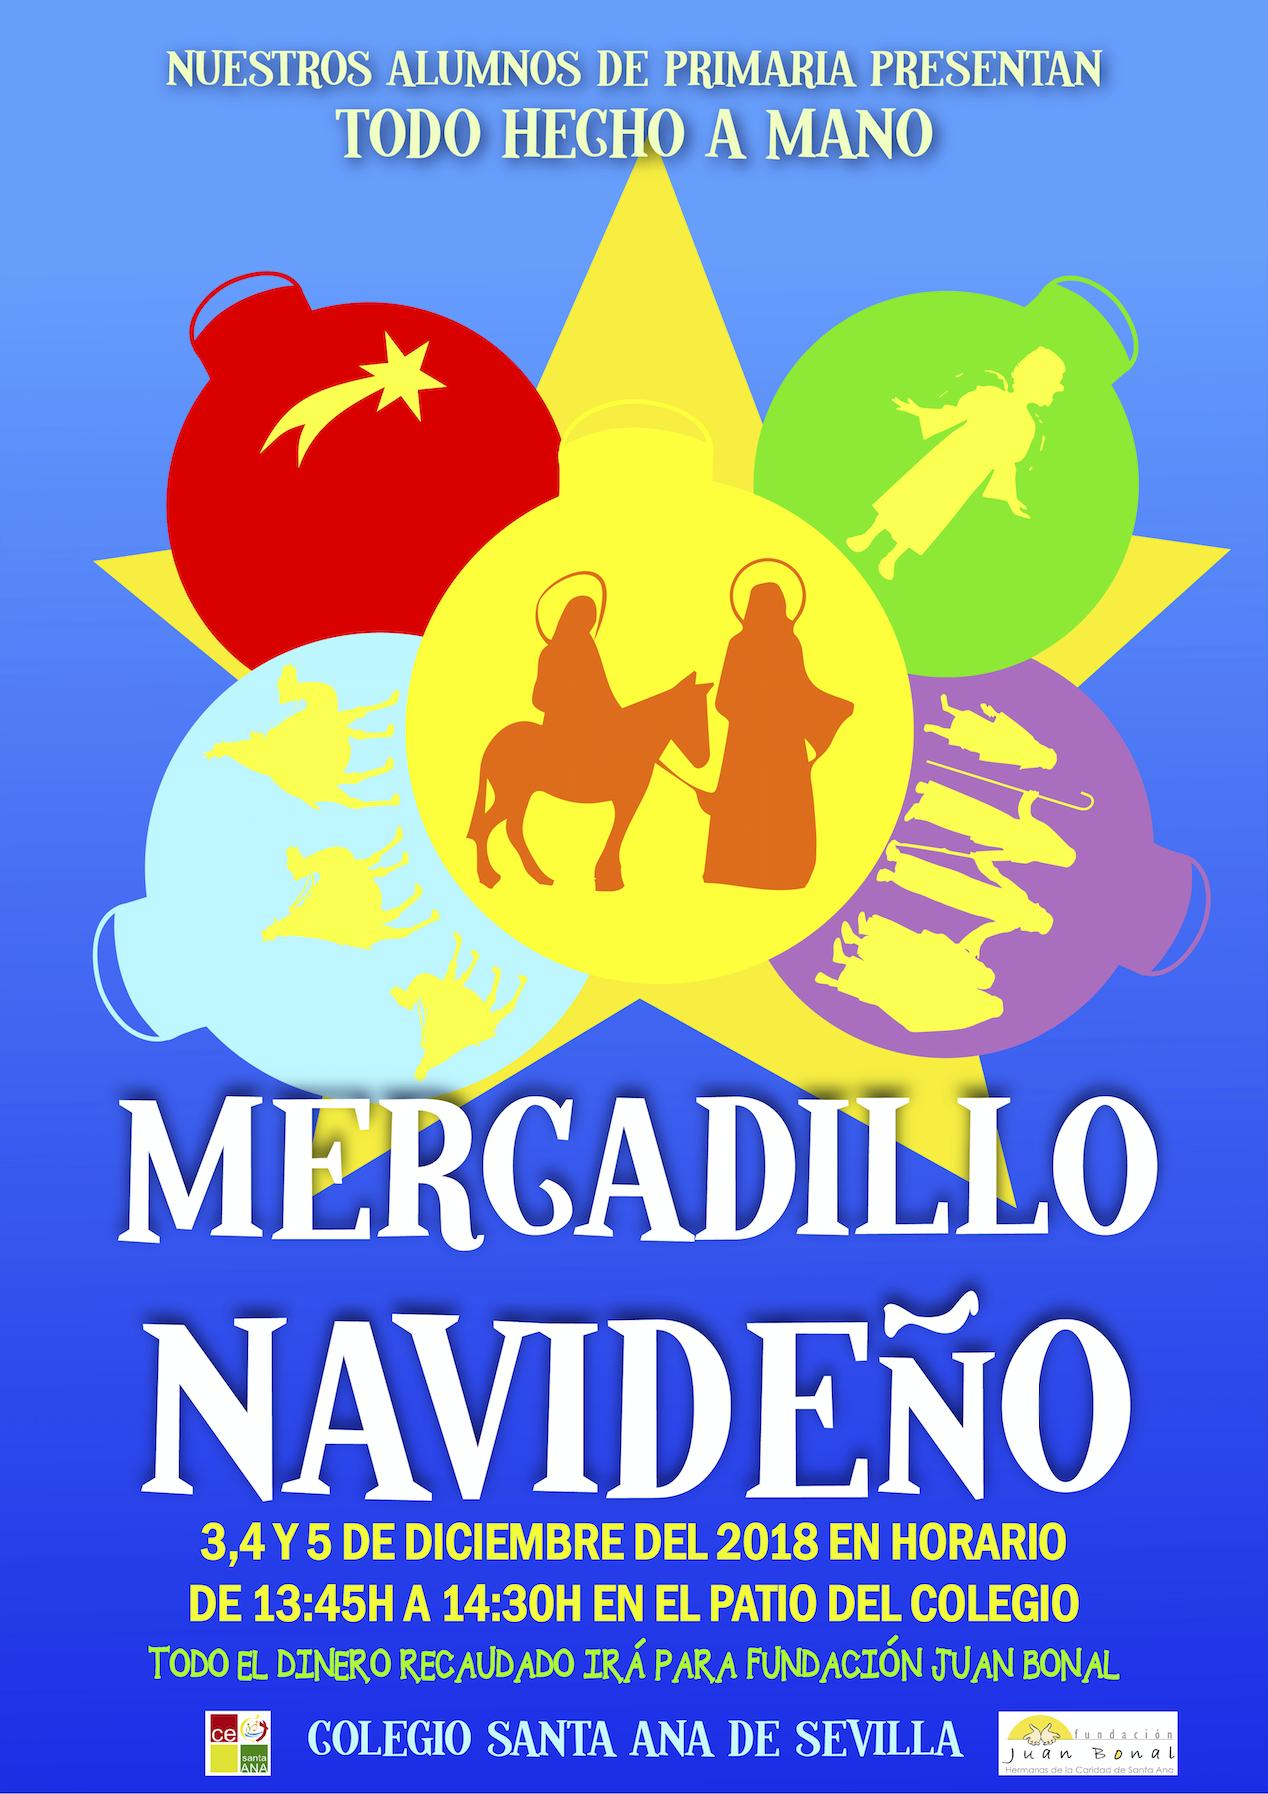 Cartel Mercadillo Navideño 2018-19